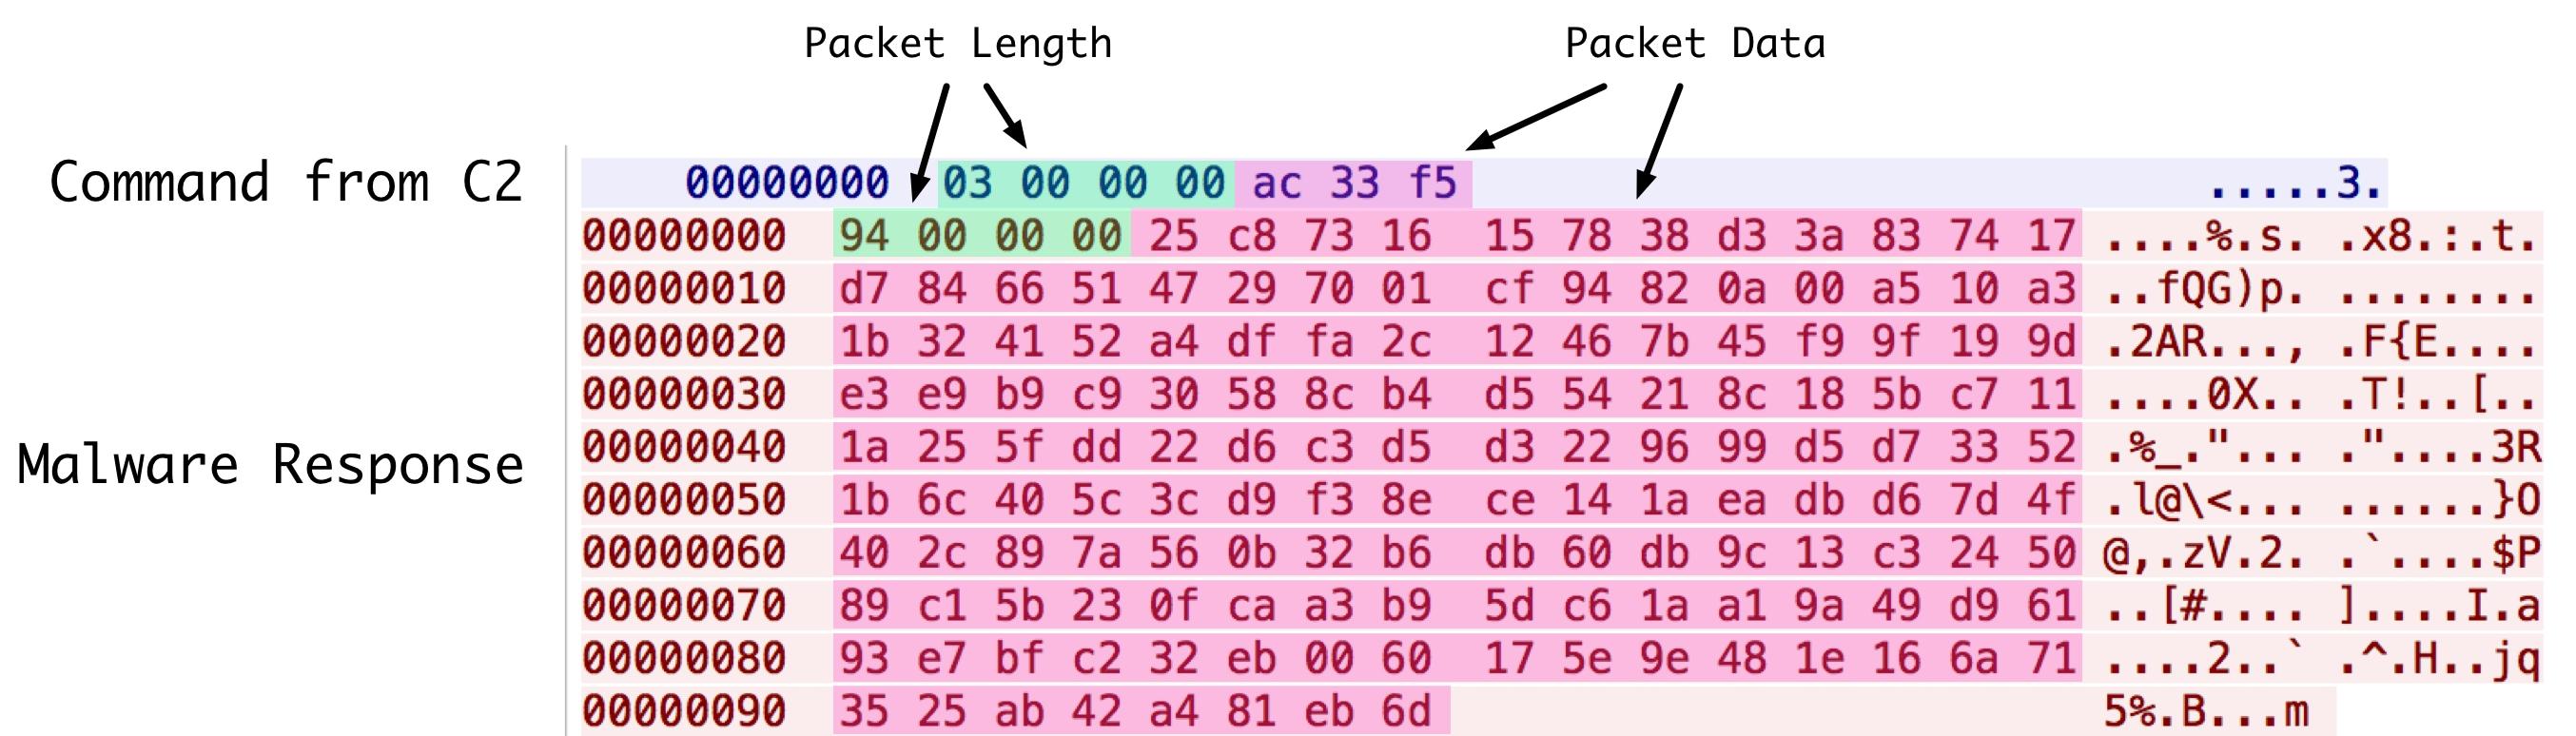 cardinal_network_config